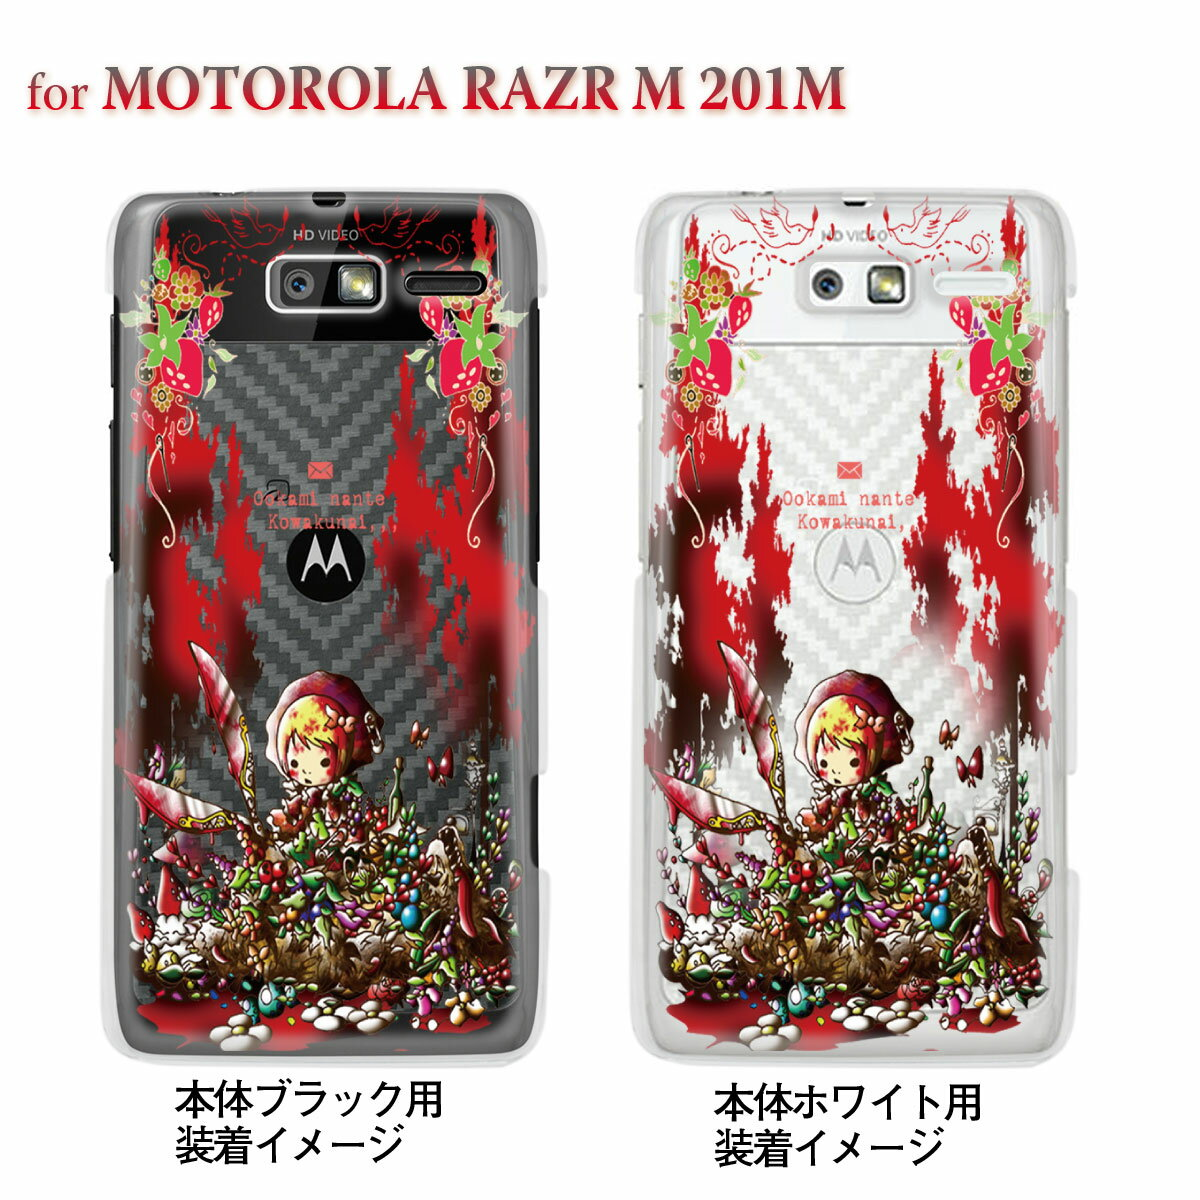 【Little World】【MOTOROLA RAZR M 201M】【201M】【Soft Bank】【カバー】【スマホケース】【クリアケース】【アート】【赤ずきんちゃん】【オオカミなんてコワクない】【グリム童話】 25-201m-am0027